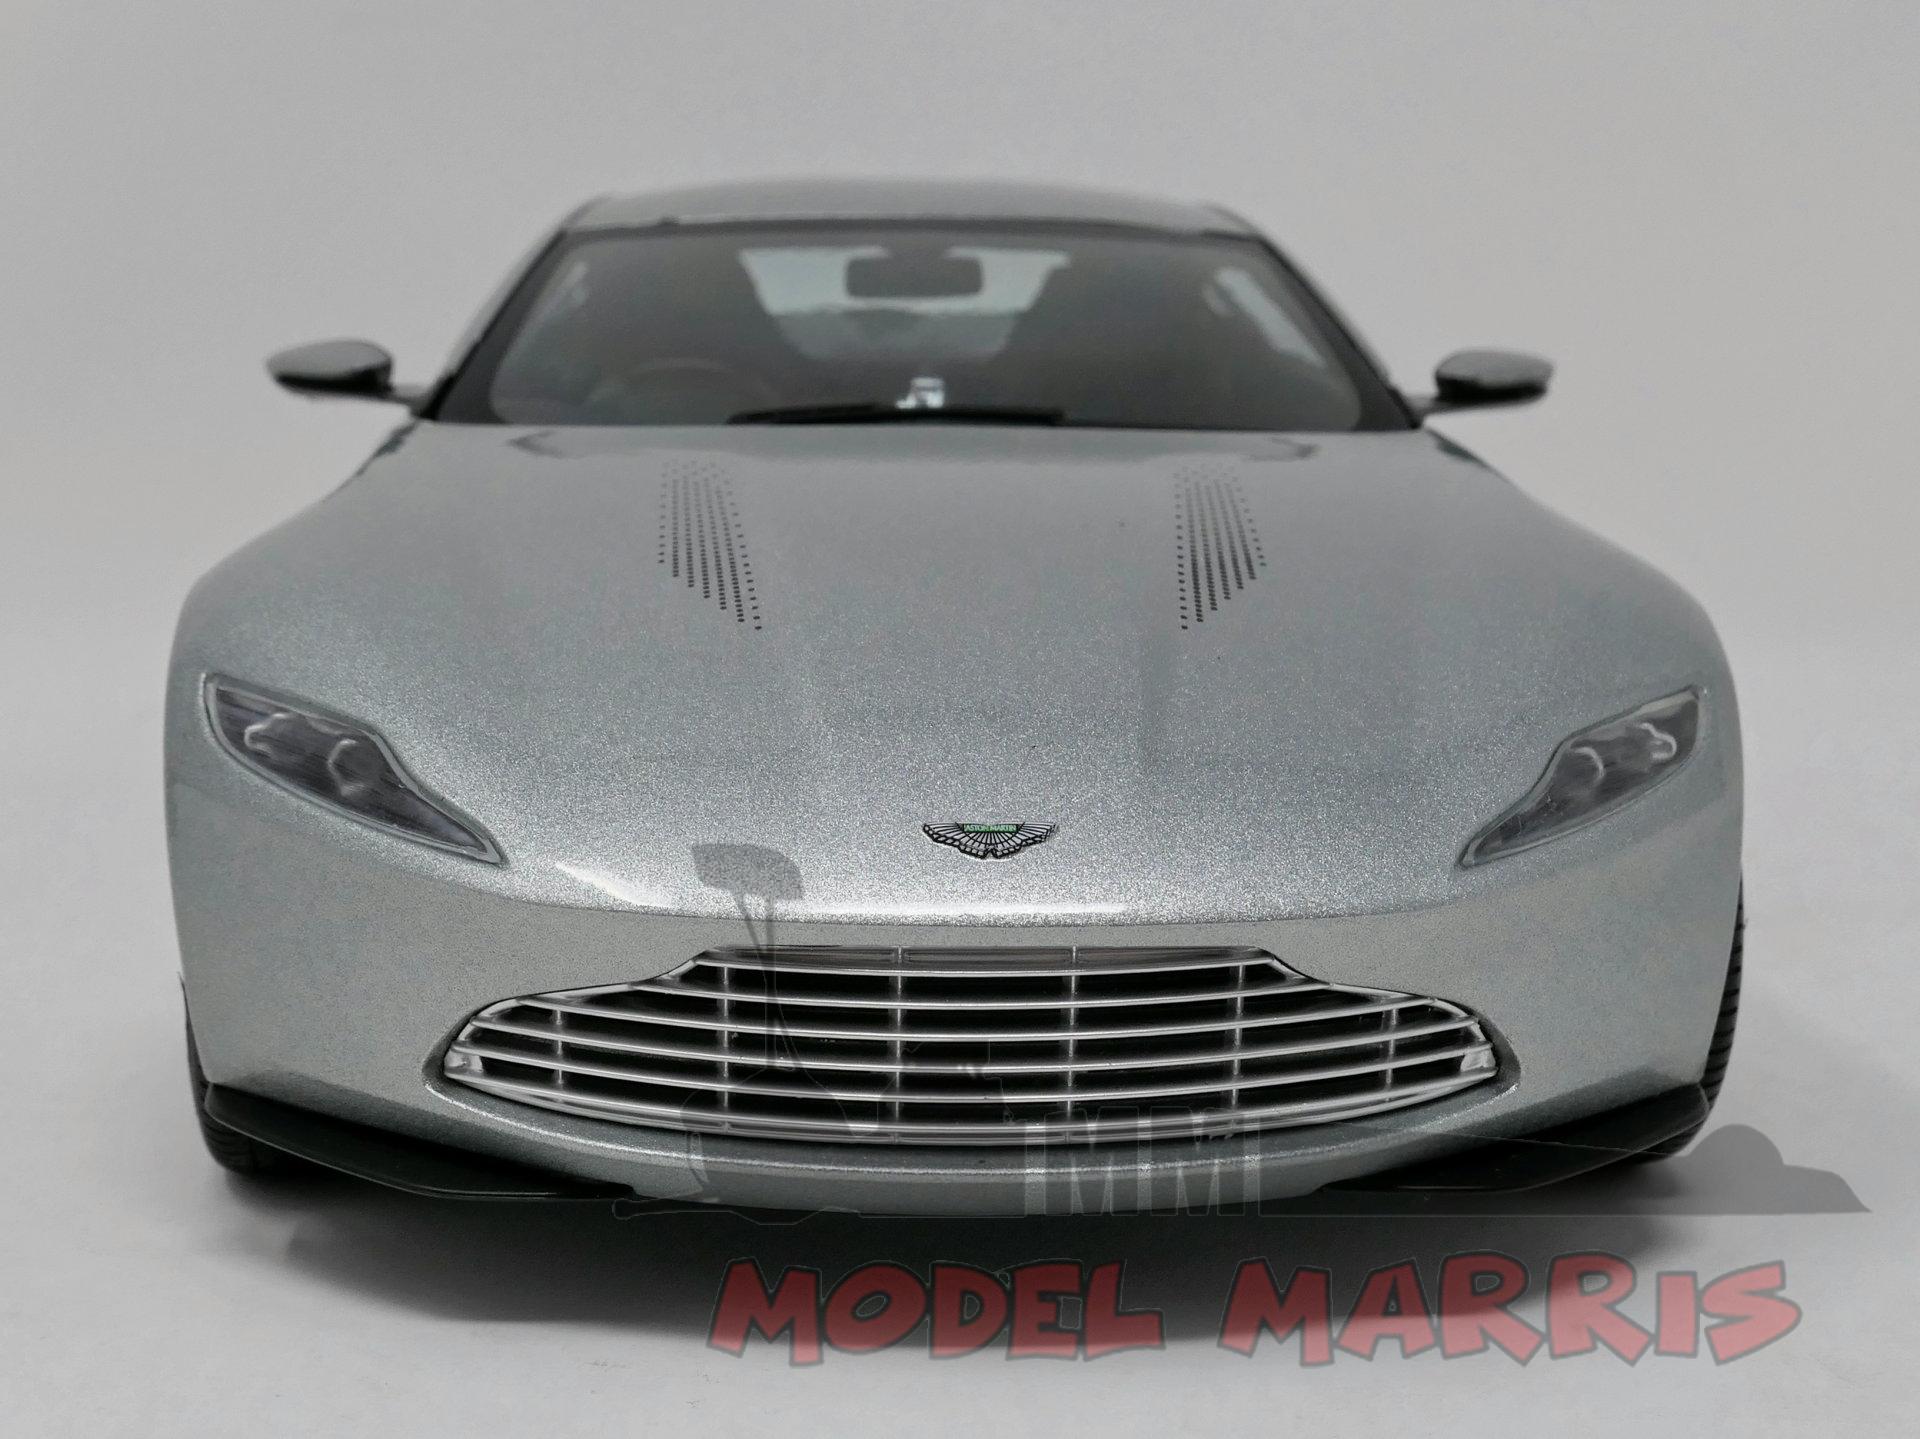 Mattel Hot Wheels Elite Aston Martin Db10 2015 007 James Bond Spectre